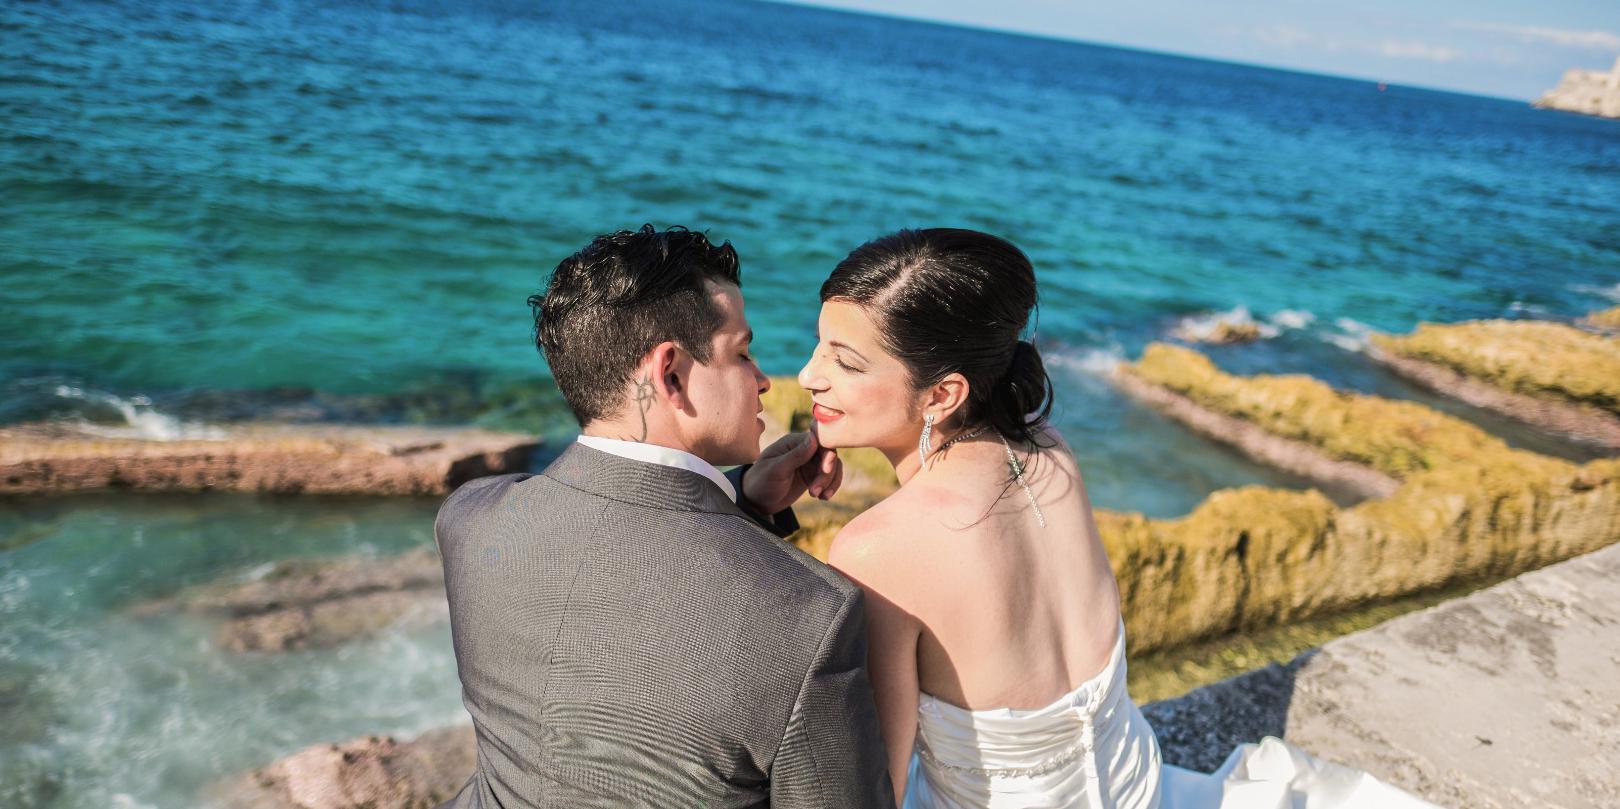 bodas-sin-clasificar-sin-tema-cuba-25881.jpg